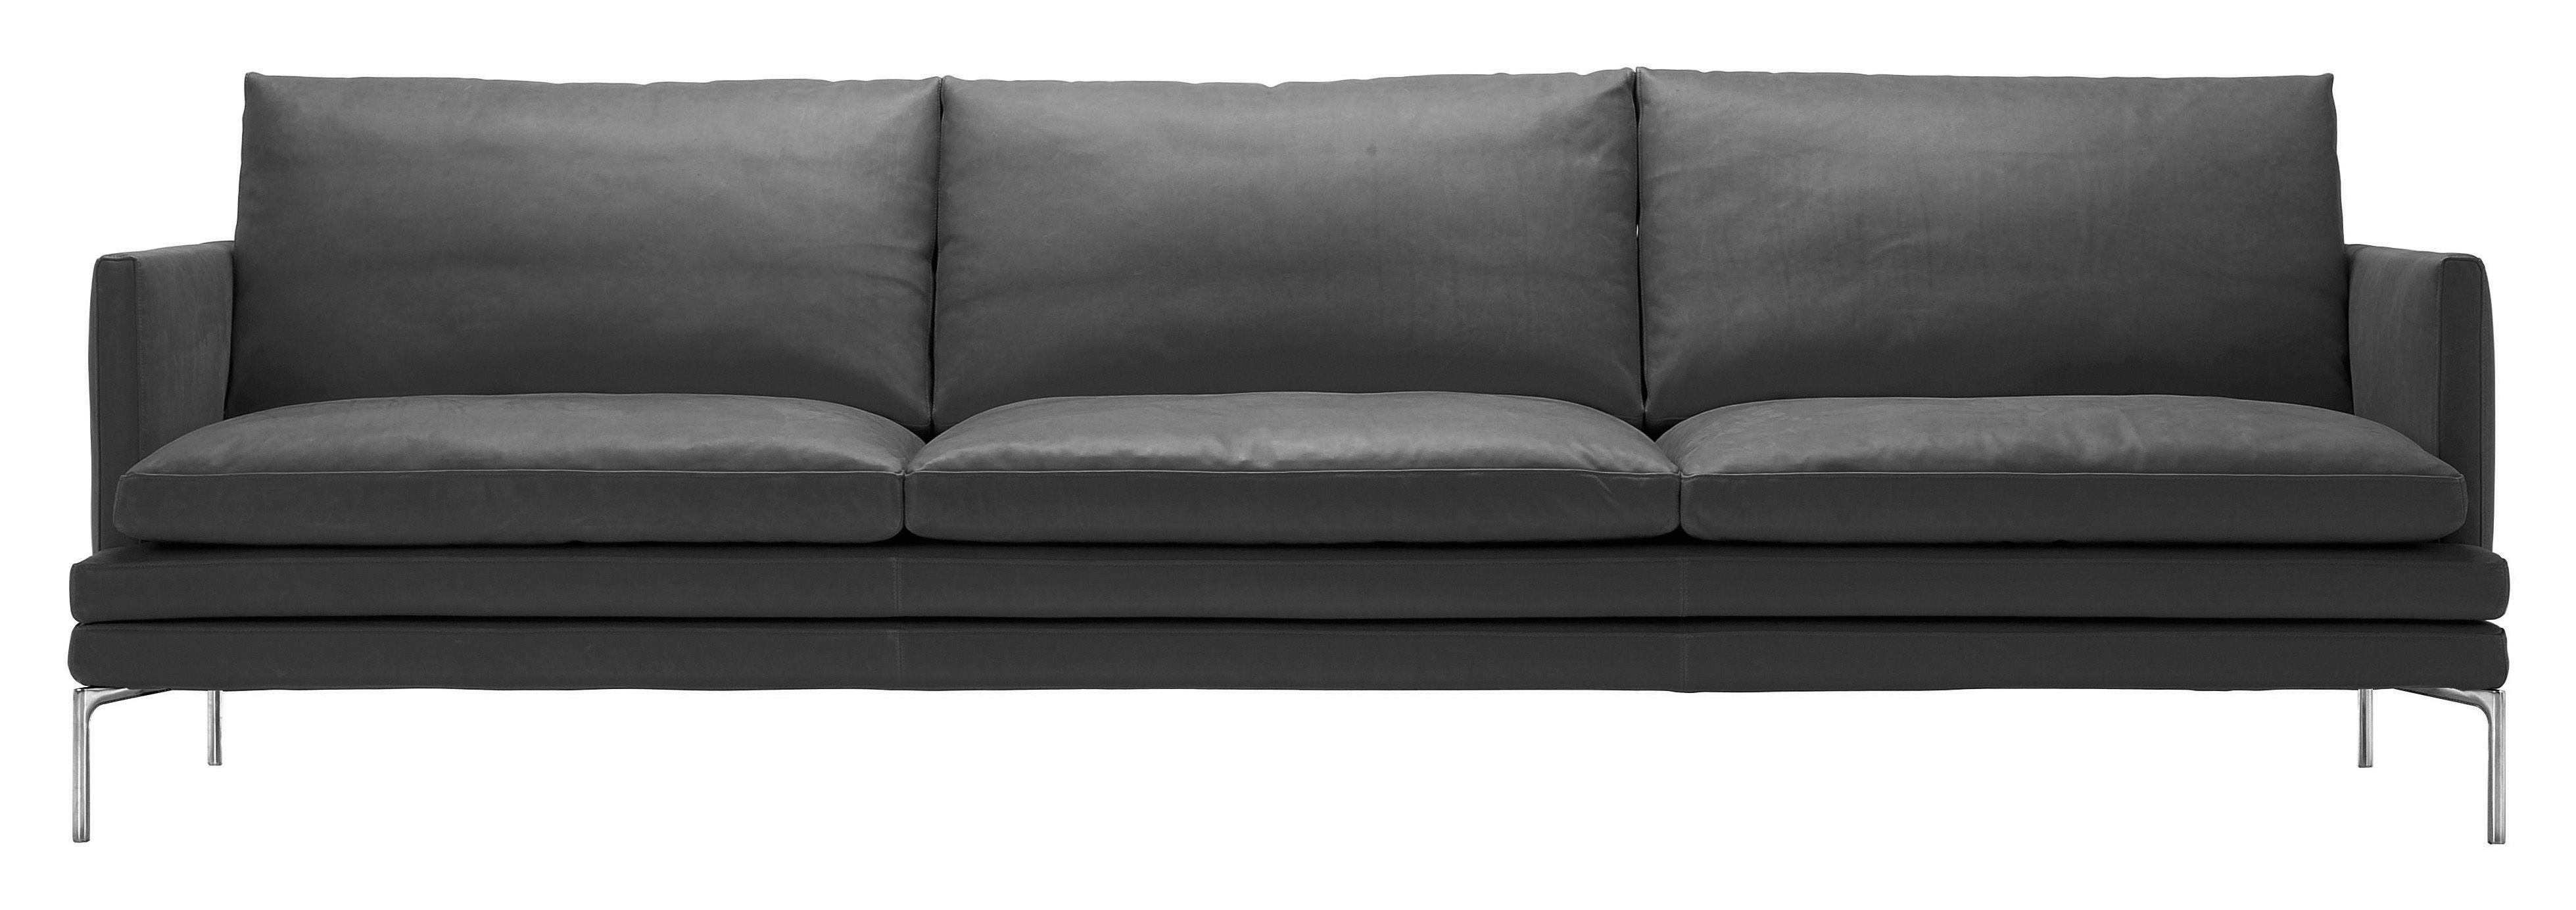 Canap droit william tissu 3 places l 266 cm gris for Canape zanotta